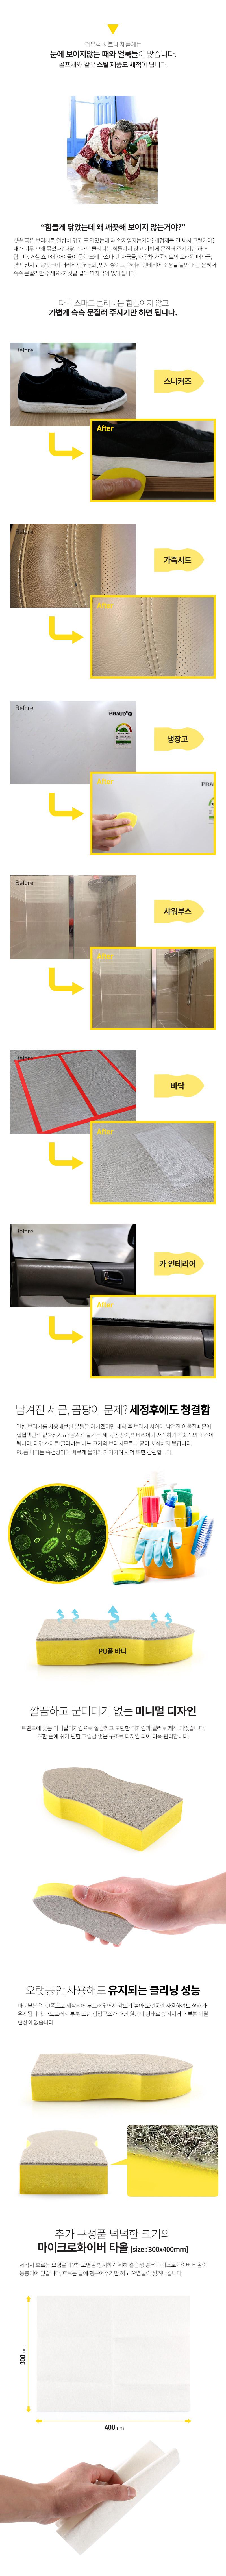 multi_cleaner_daddak_13_104607.jpg